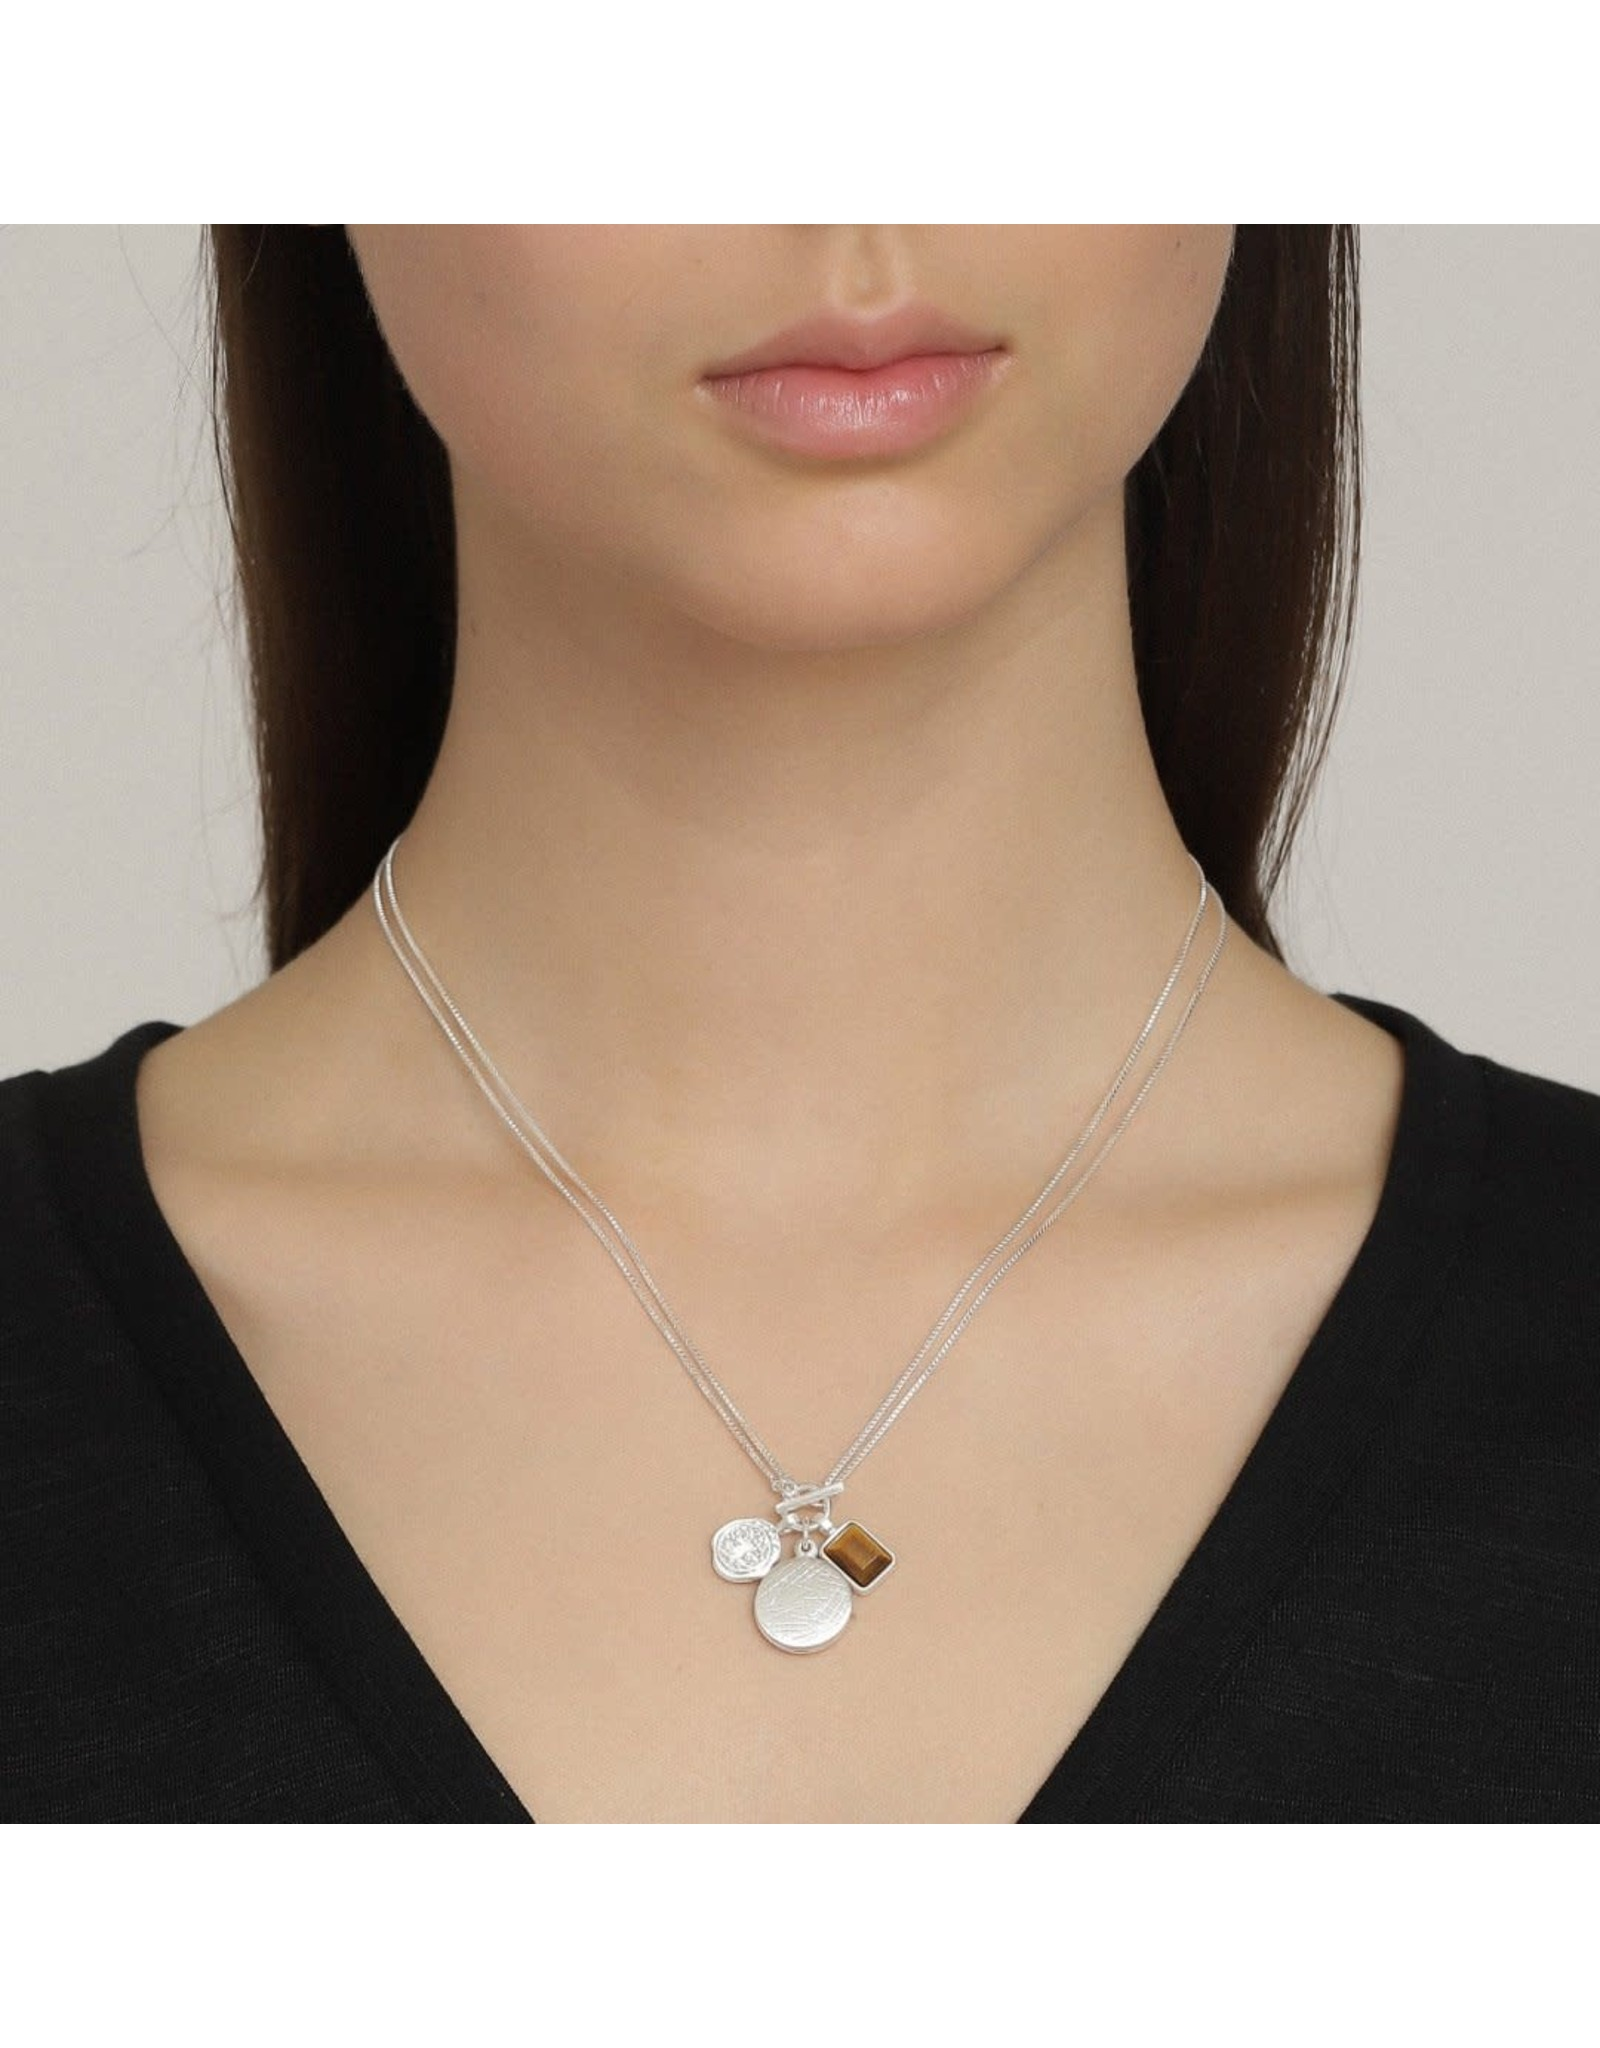 Pilgrim Pilgrim Verdandi Necklace II Silver Plated Brown